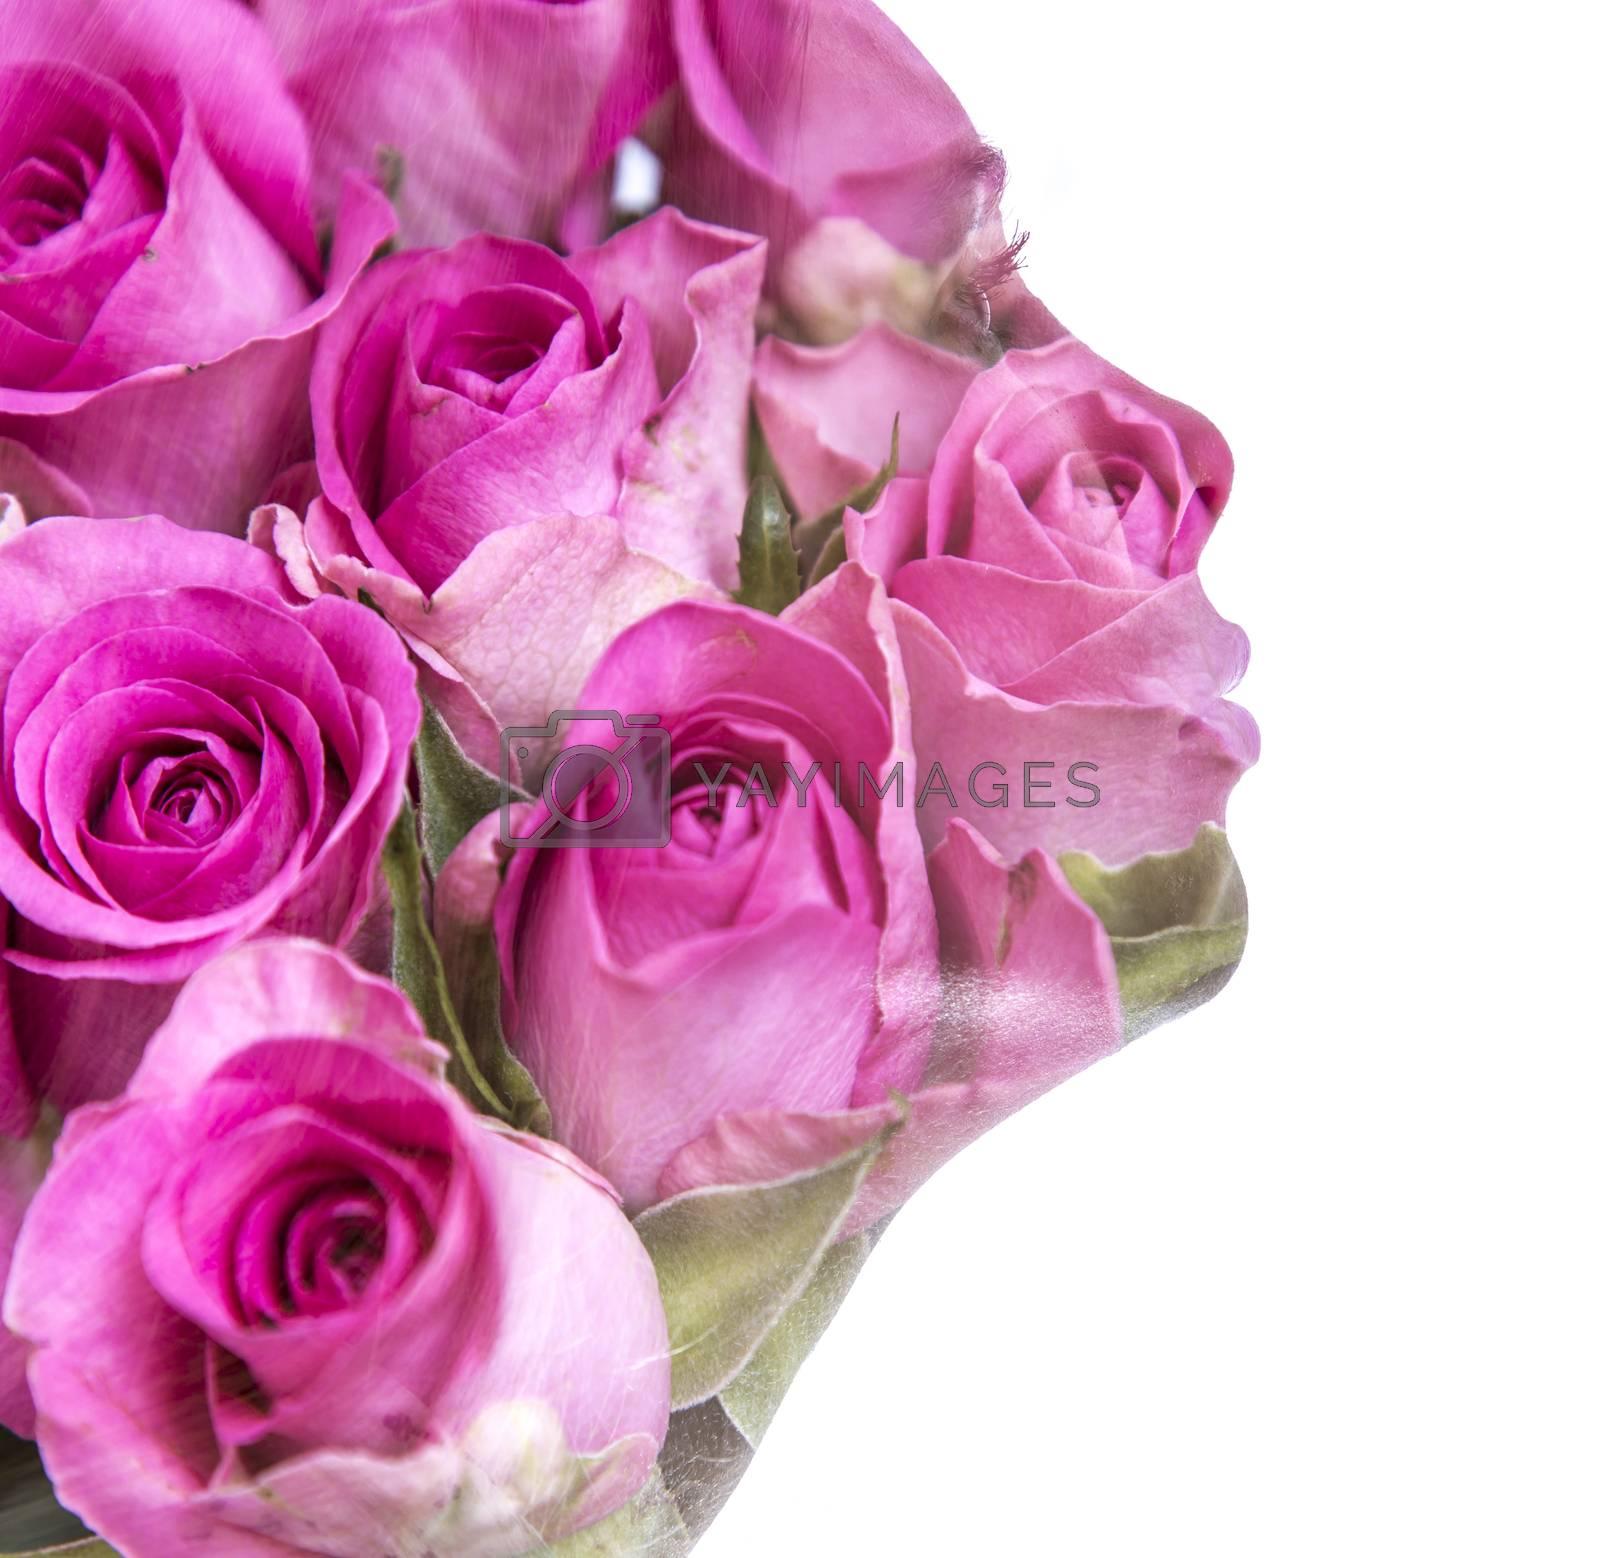 Female Silhouette of Roses